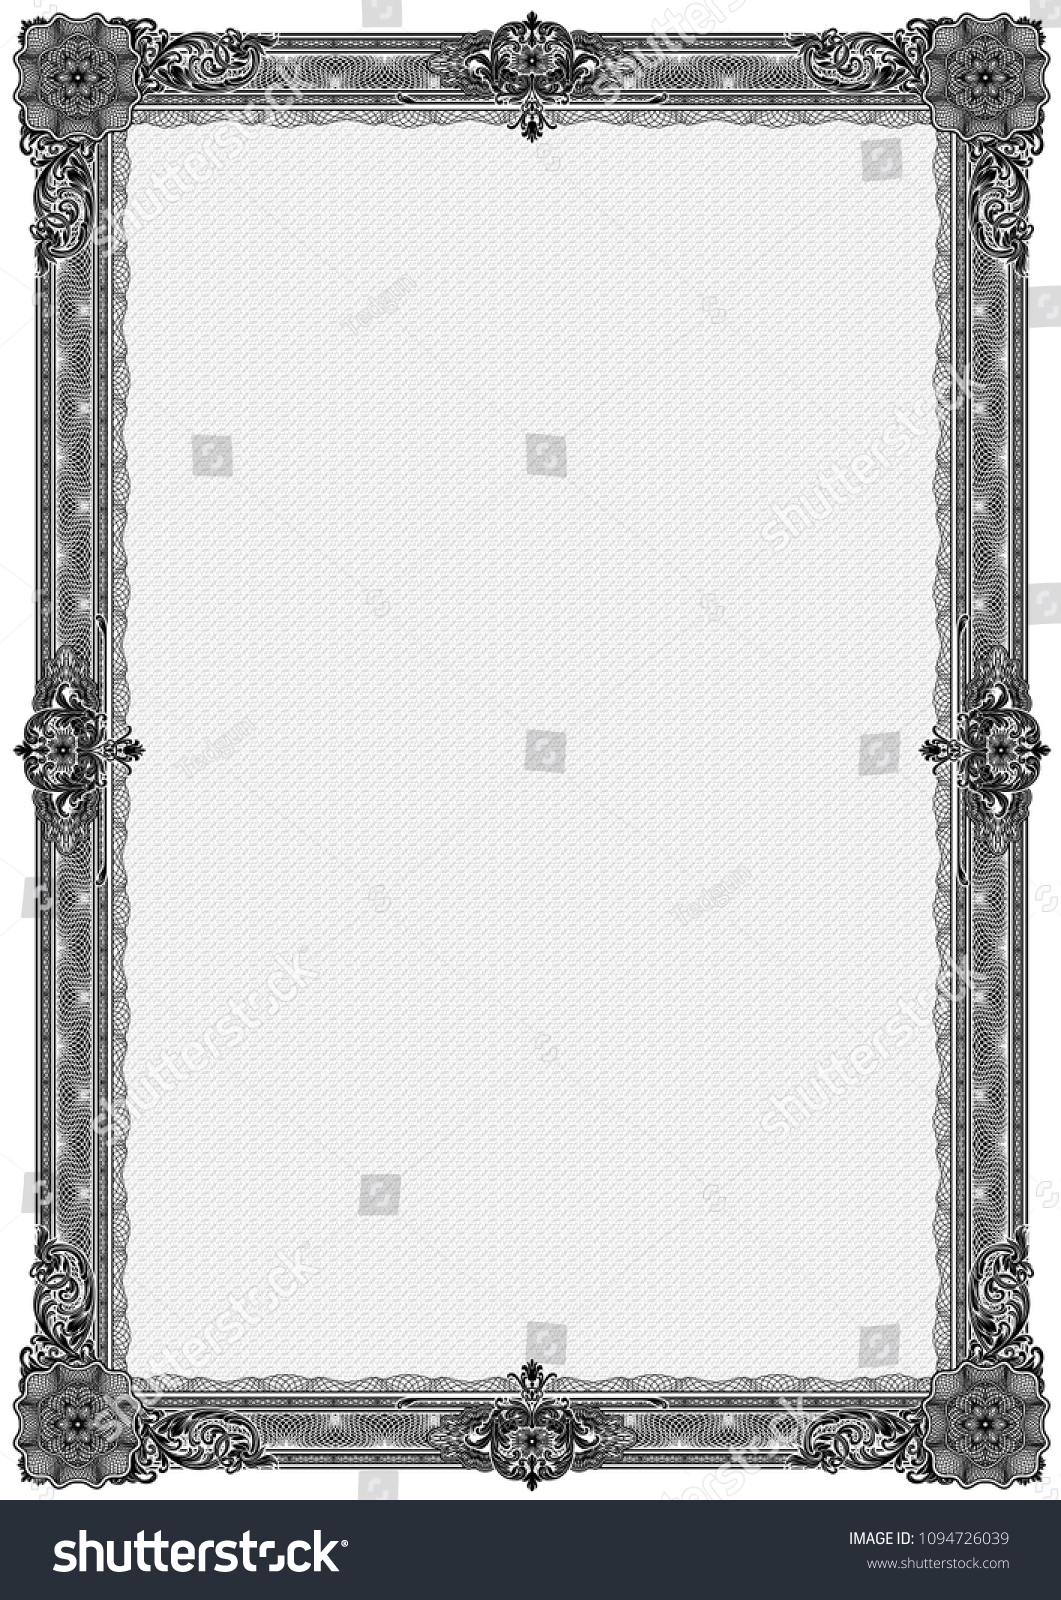 Simple Black White Certificate Frame Border Stock Photo (Photo ...